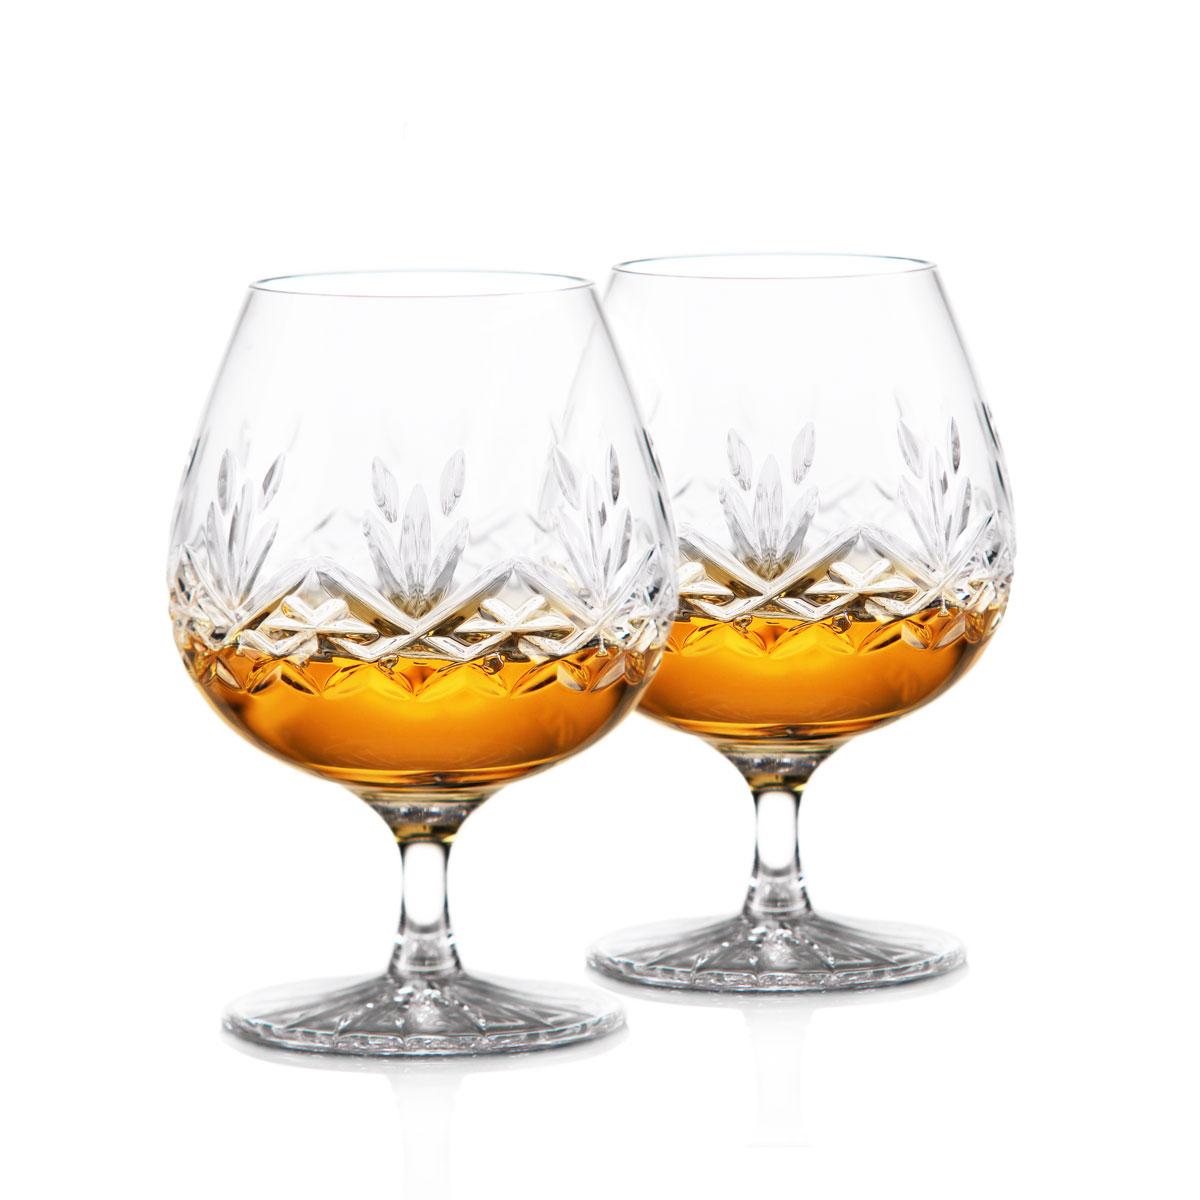 Cashs Ireland, Annestown Large Brandy, Cognac, 1+1 Free